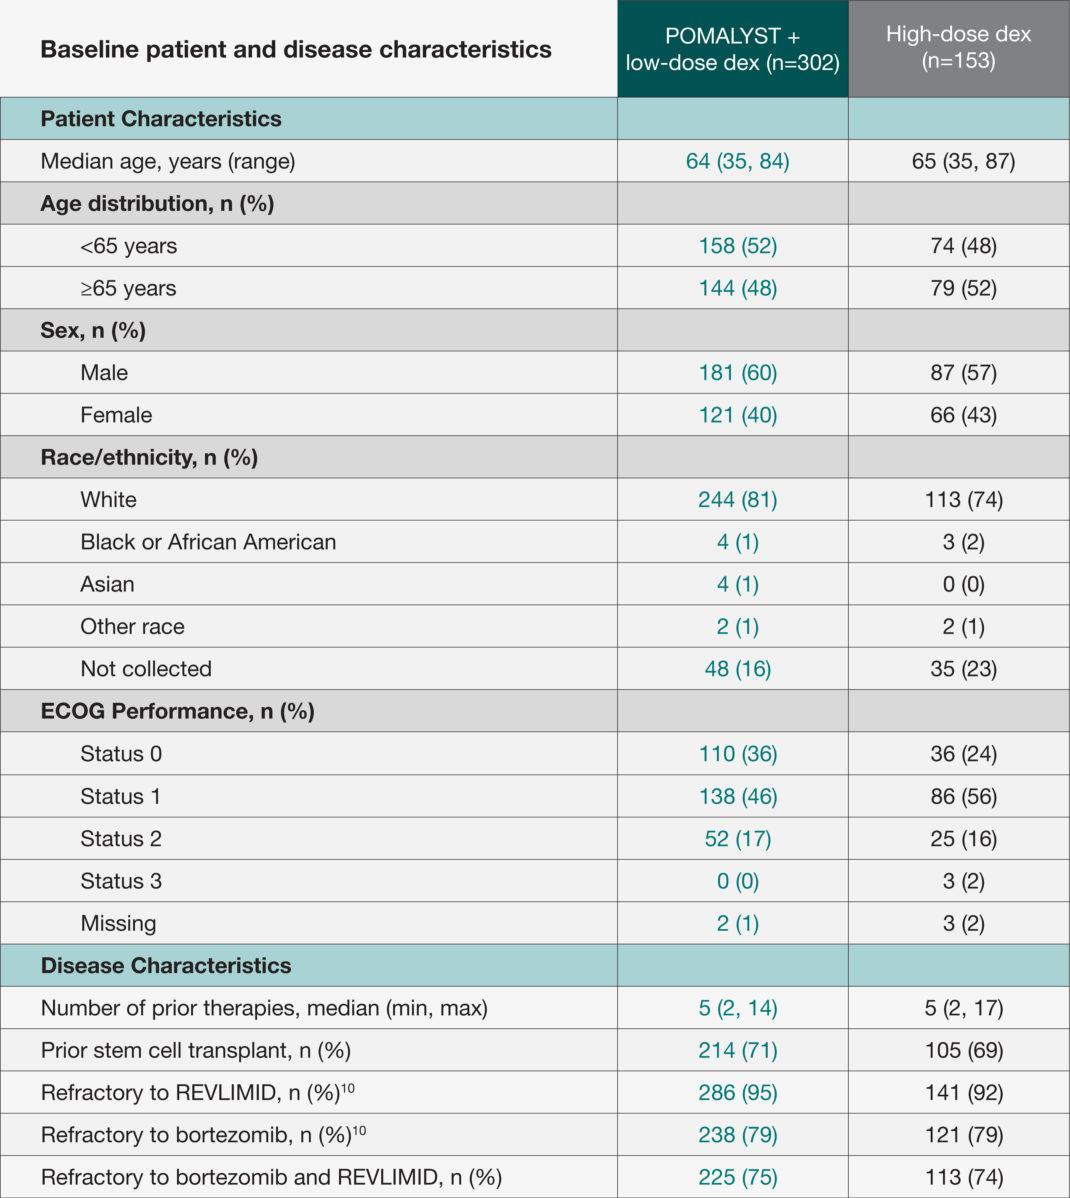 POMALYST® + dexamethasone Phase 3 Trial Baseline Characteristics